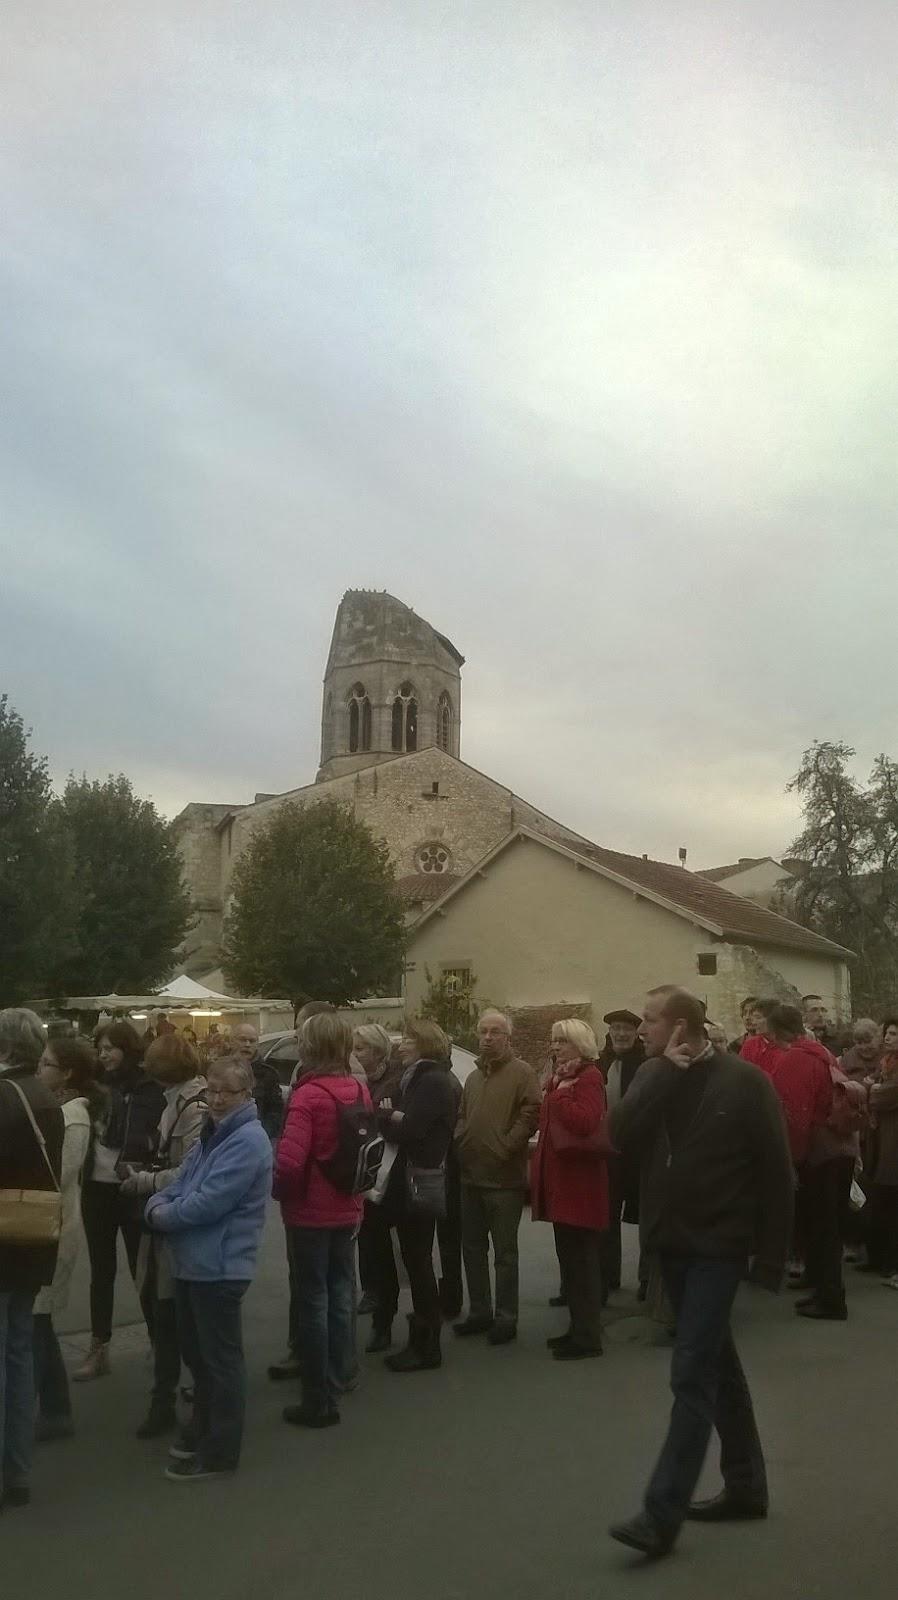 http://lafilleauxbasketsroses.blogspot.com/2014/11/course-dorientation-charroux-03.html